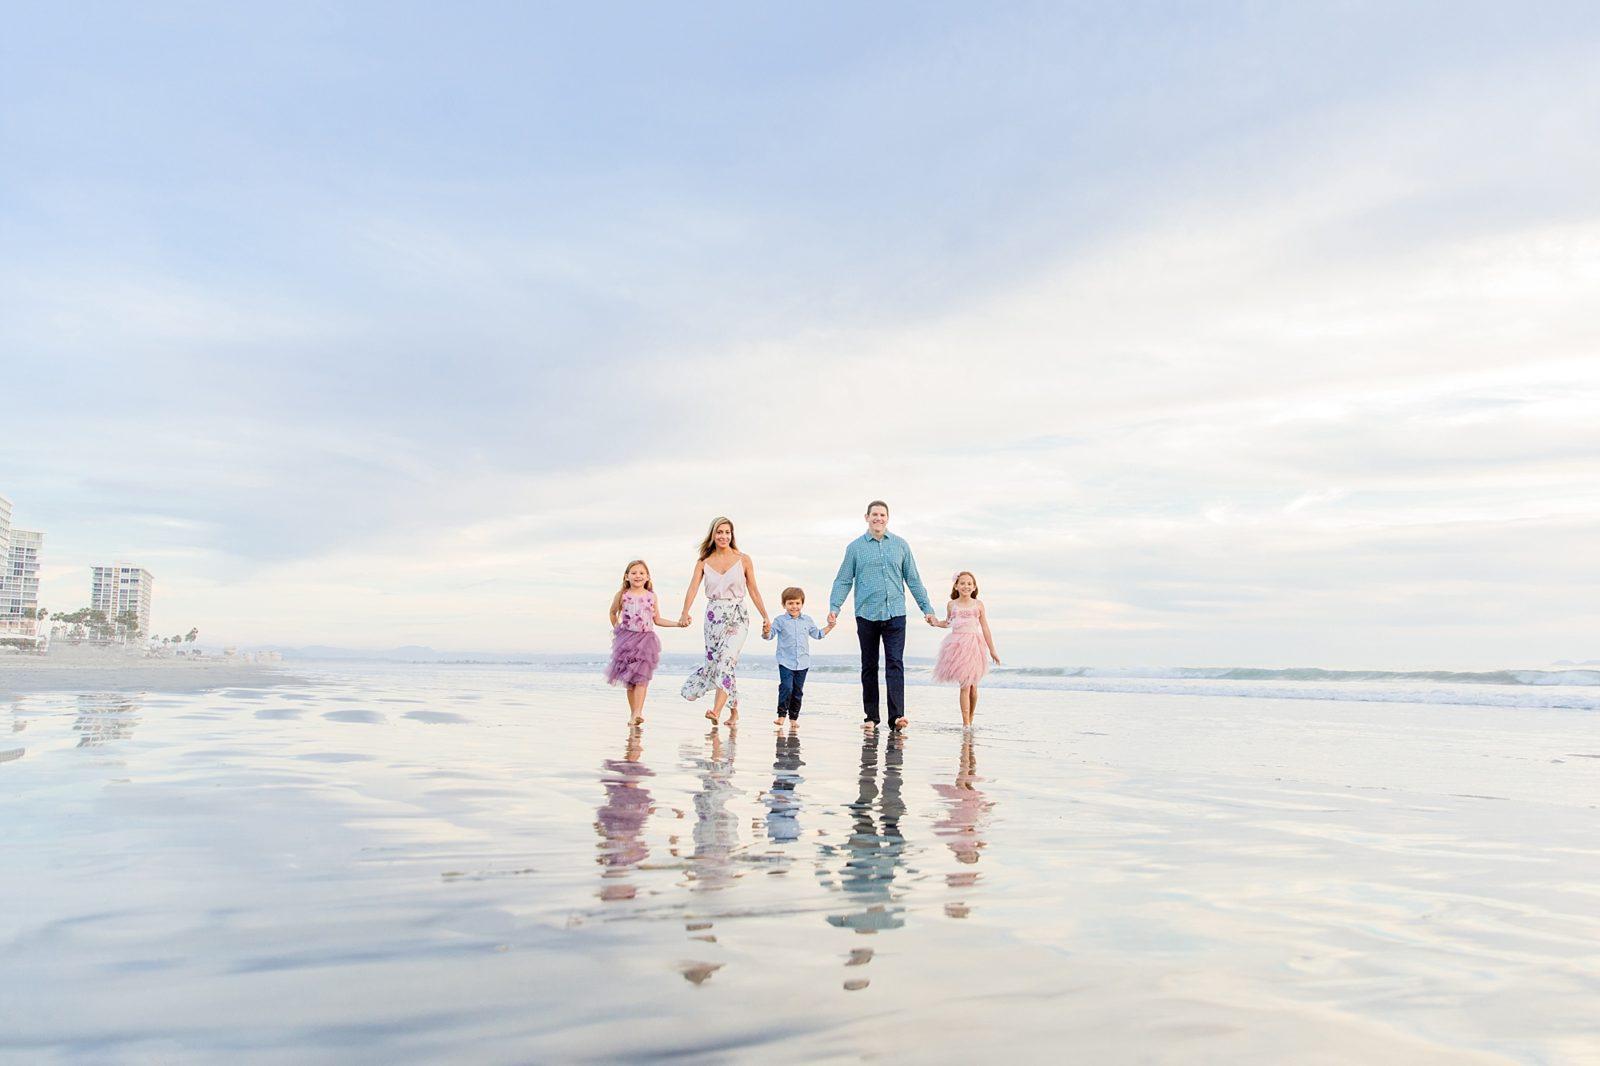 Reflection Shot | Walking on the Beach